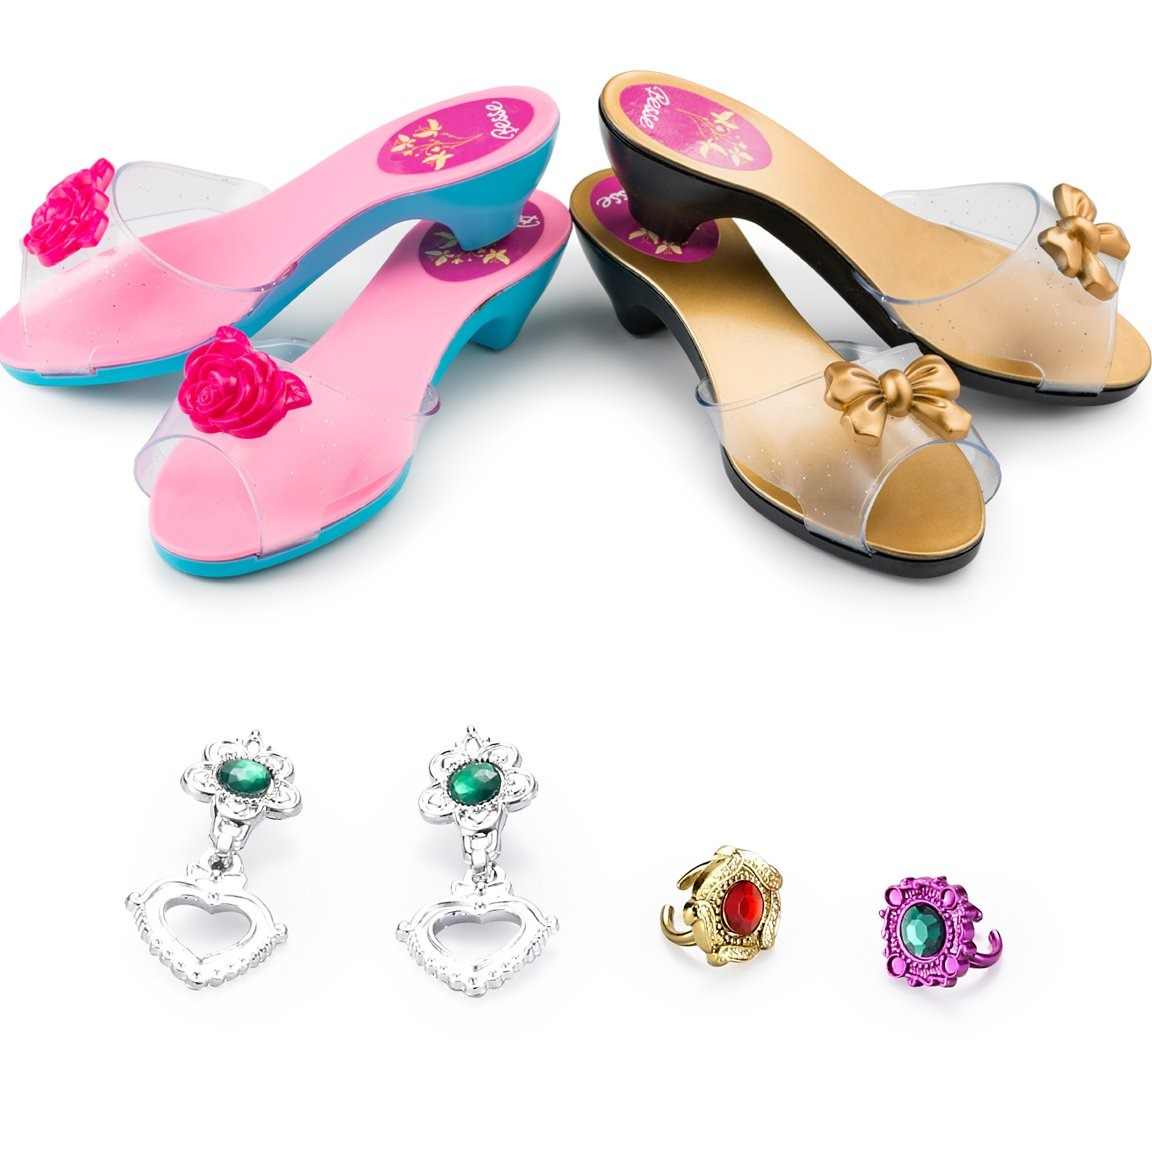 b592be520520 Jaxojoy Zapatos Y Joyas Boutique little Girl Princess P - S  204